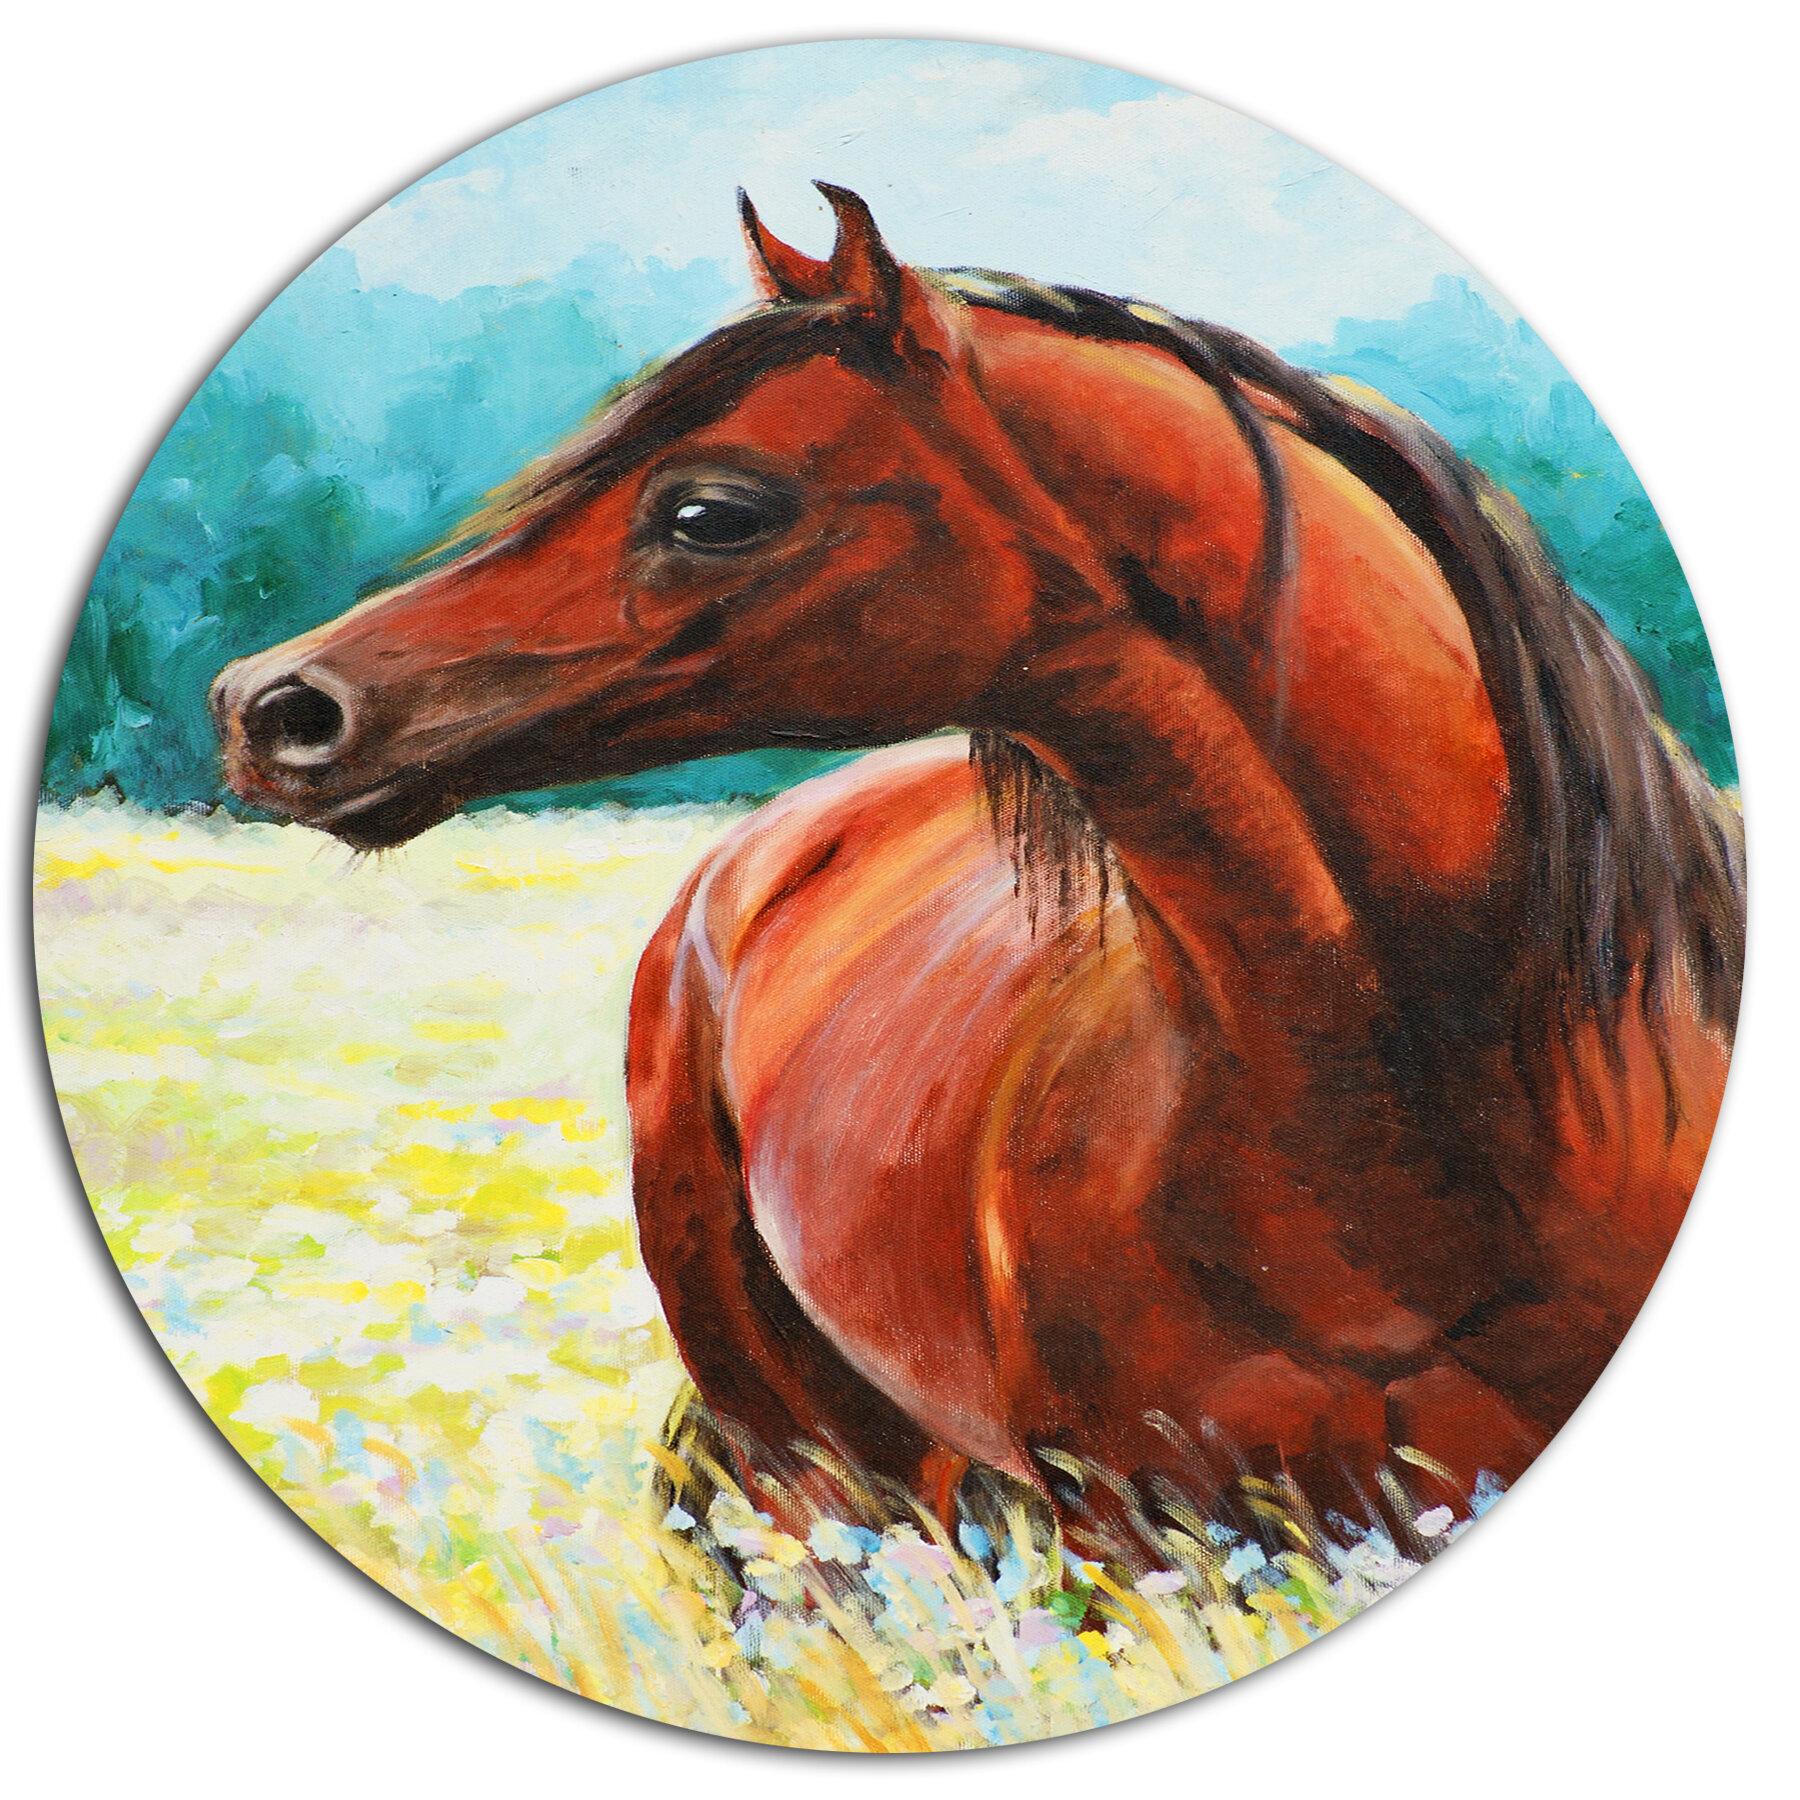 Designart Brown Arabian Horse Painting Oil Painting Print On Metal